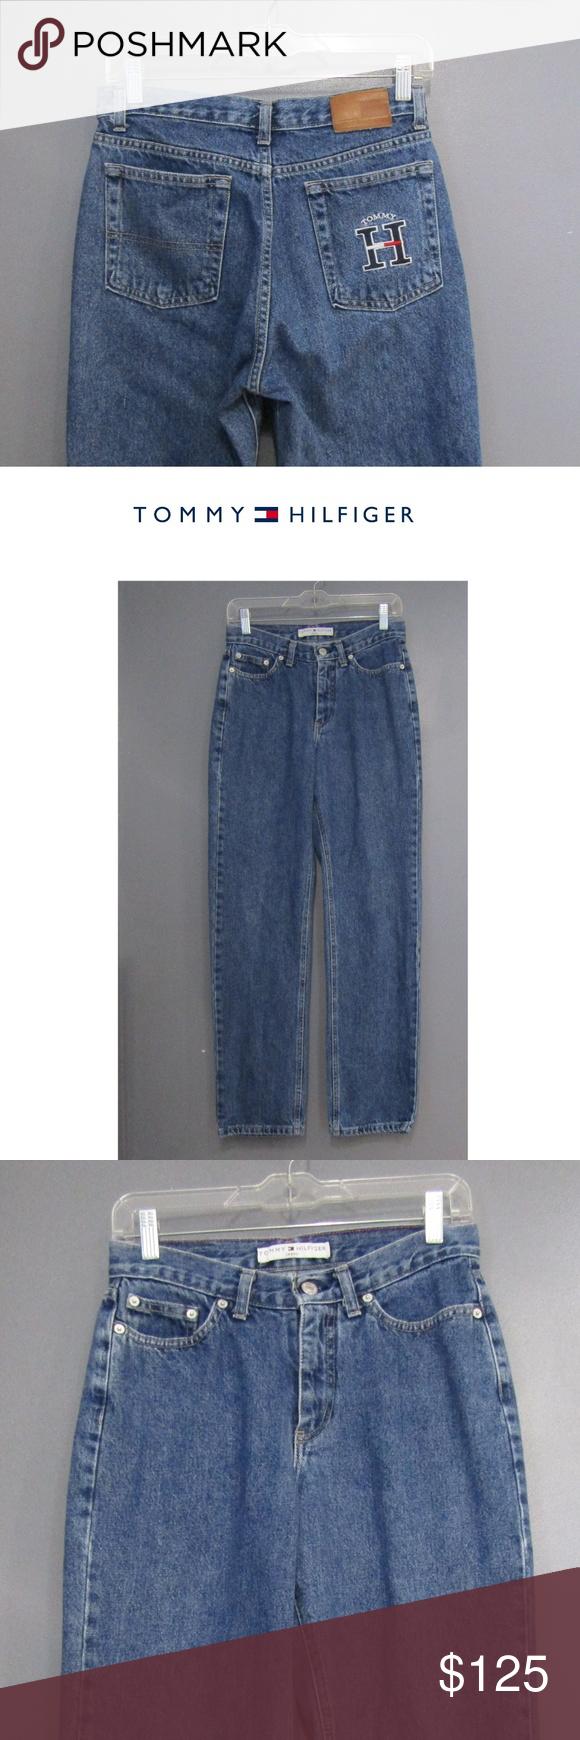 Vintage Tommy Hilfiger Canada Blue Jeans Size 4 Tommy Hilfiger Clothes Design Tommy Hilfiger Jeans